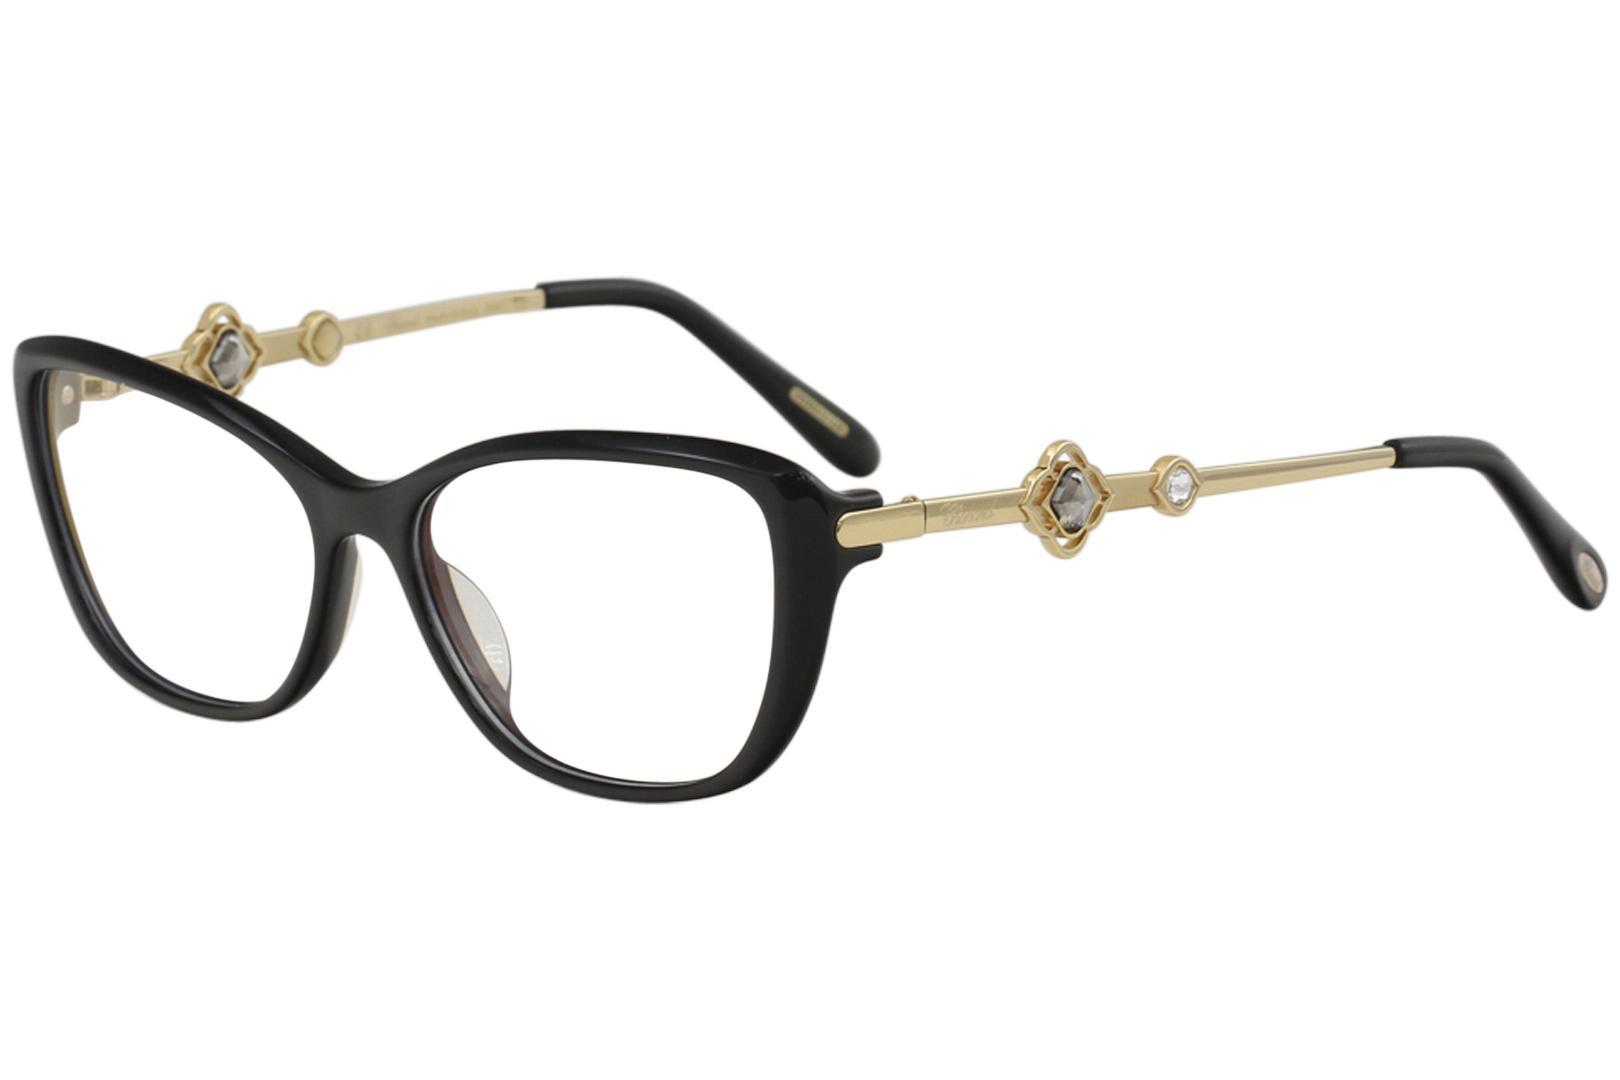 1f28c76f17 Chopard Eyeglasses VCH224S VCH   224S 0700 Black   23K Gold Full Rim  Optical Frame